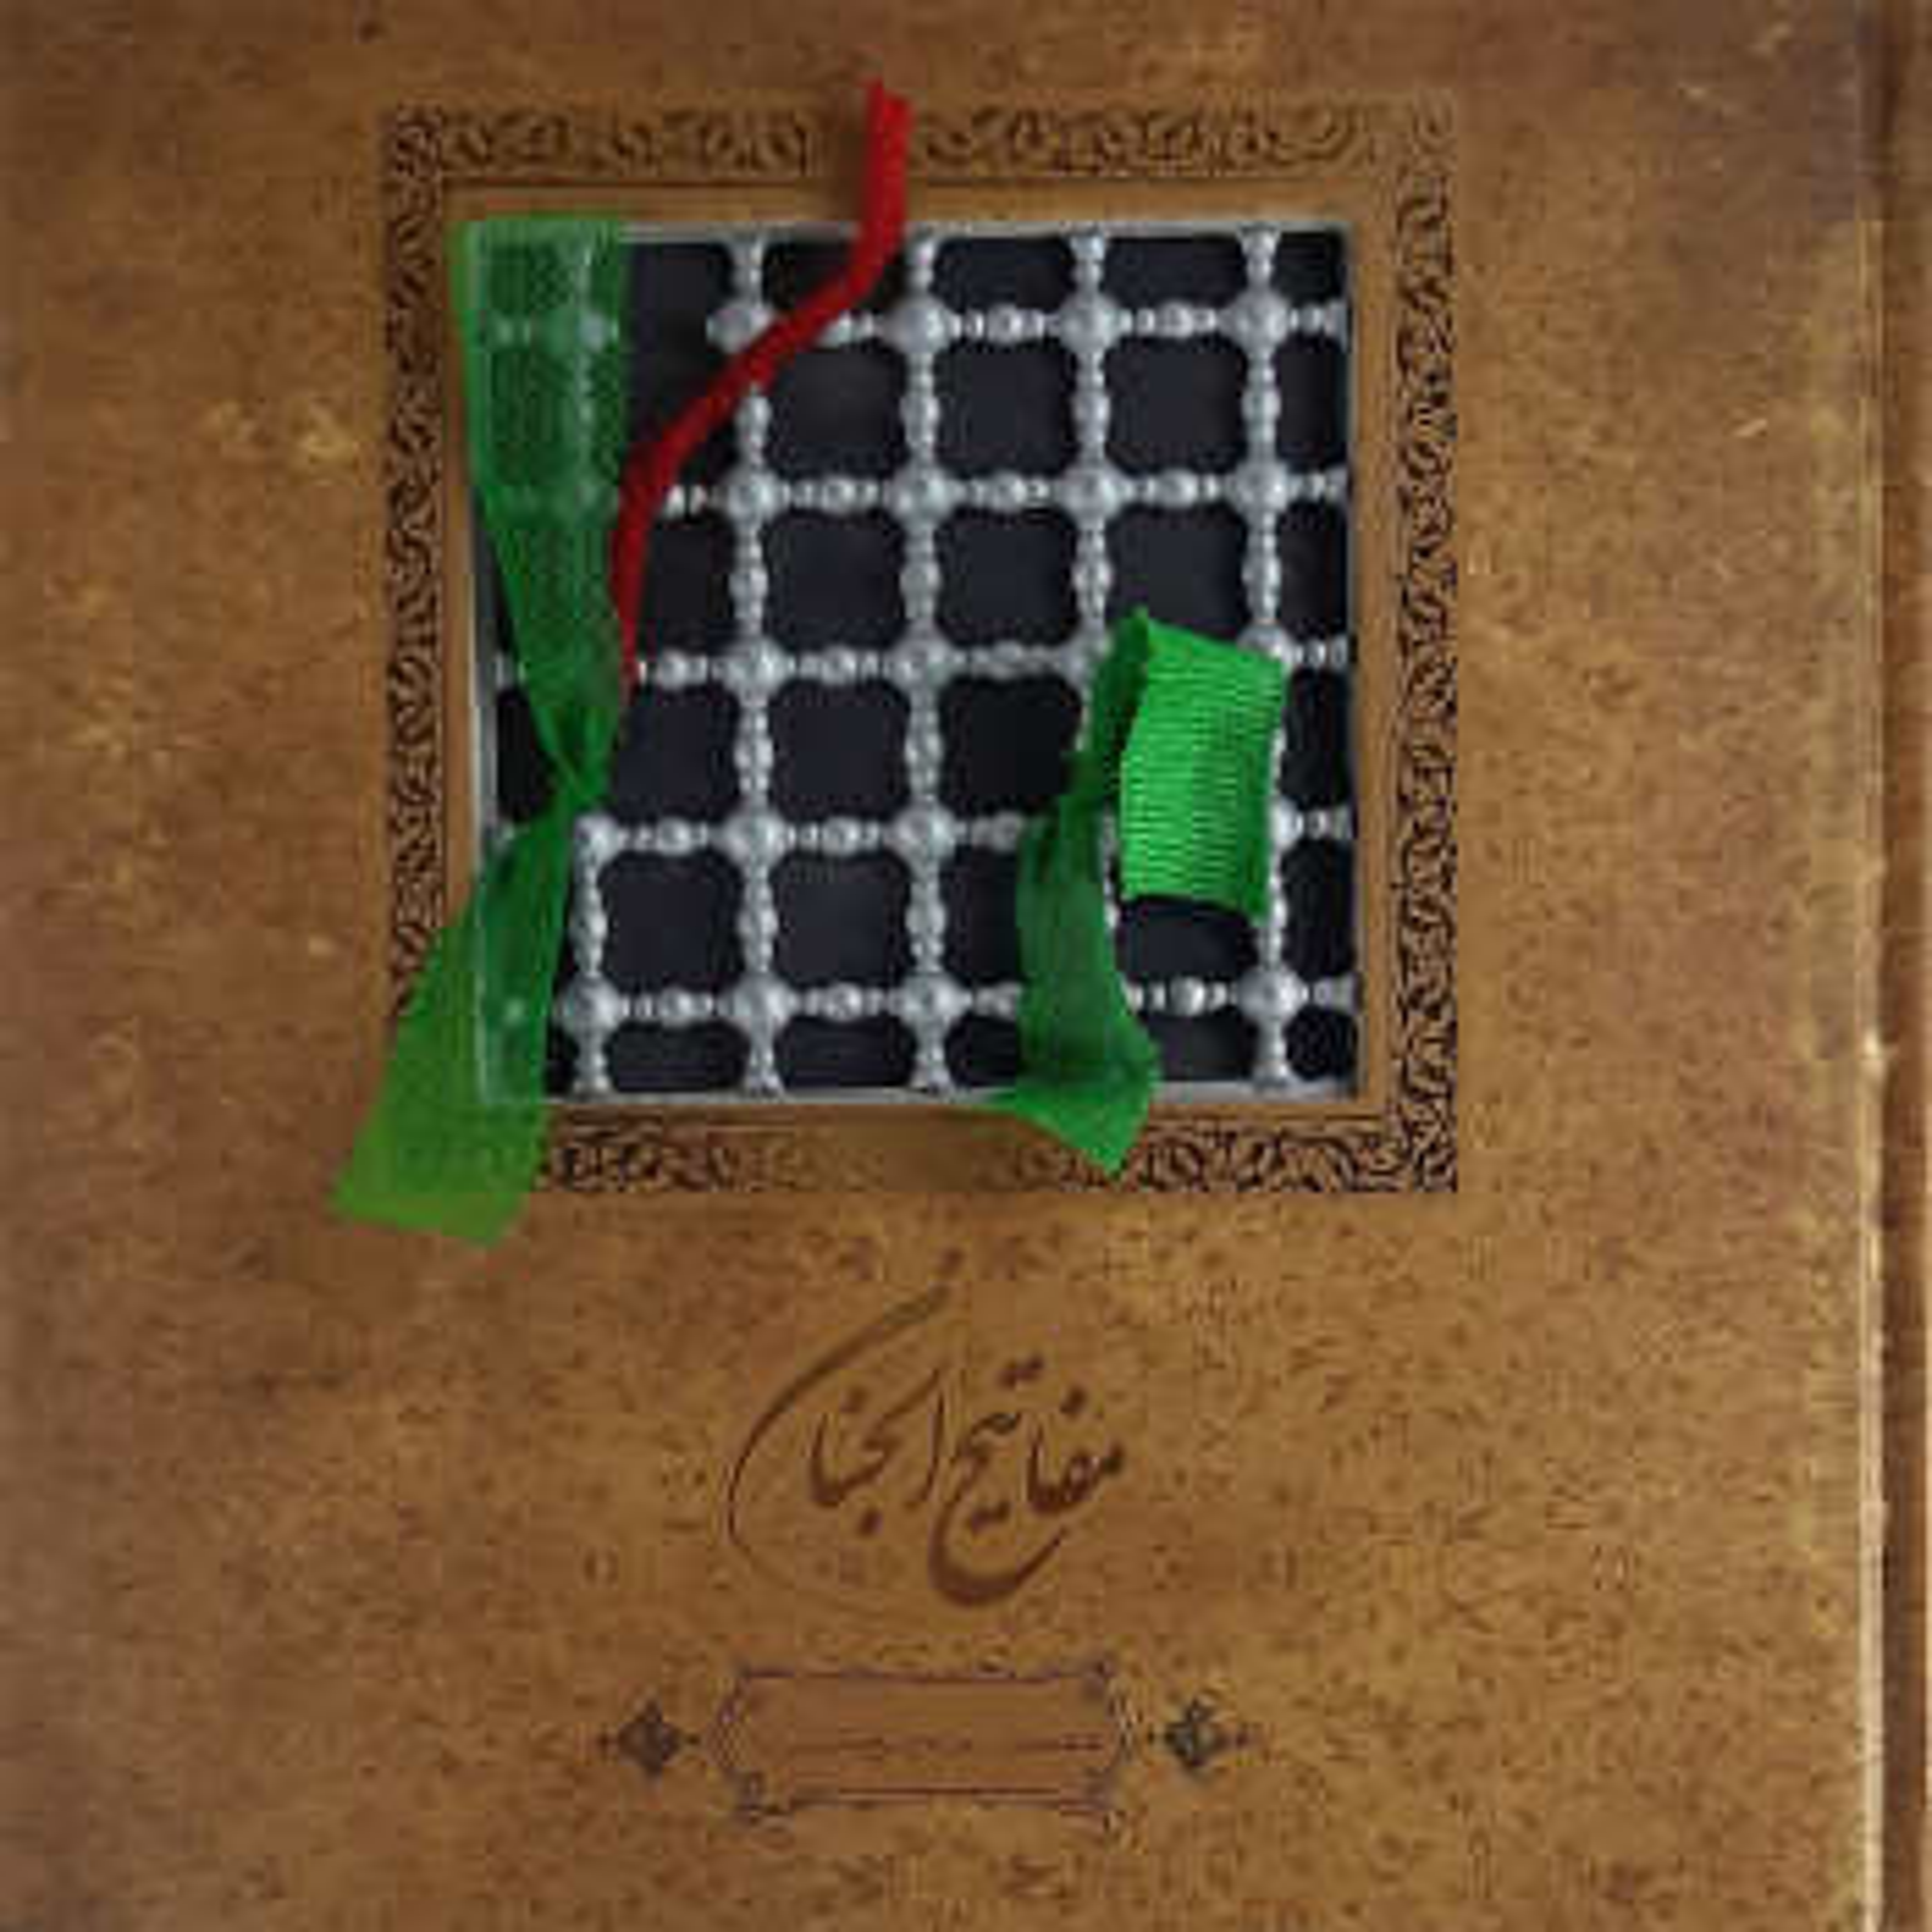 کتاب مفاتیح الجنان ترجمه شیخ عباس قمی نشر سپاس